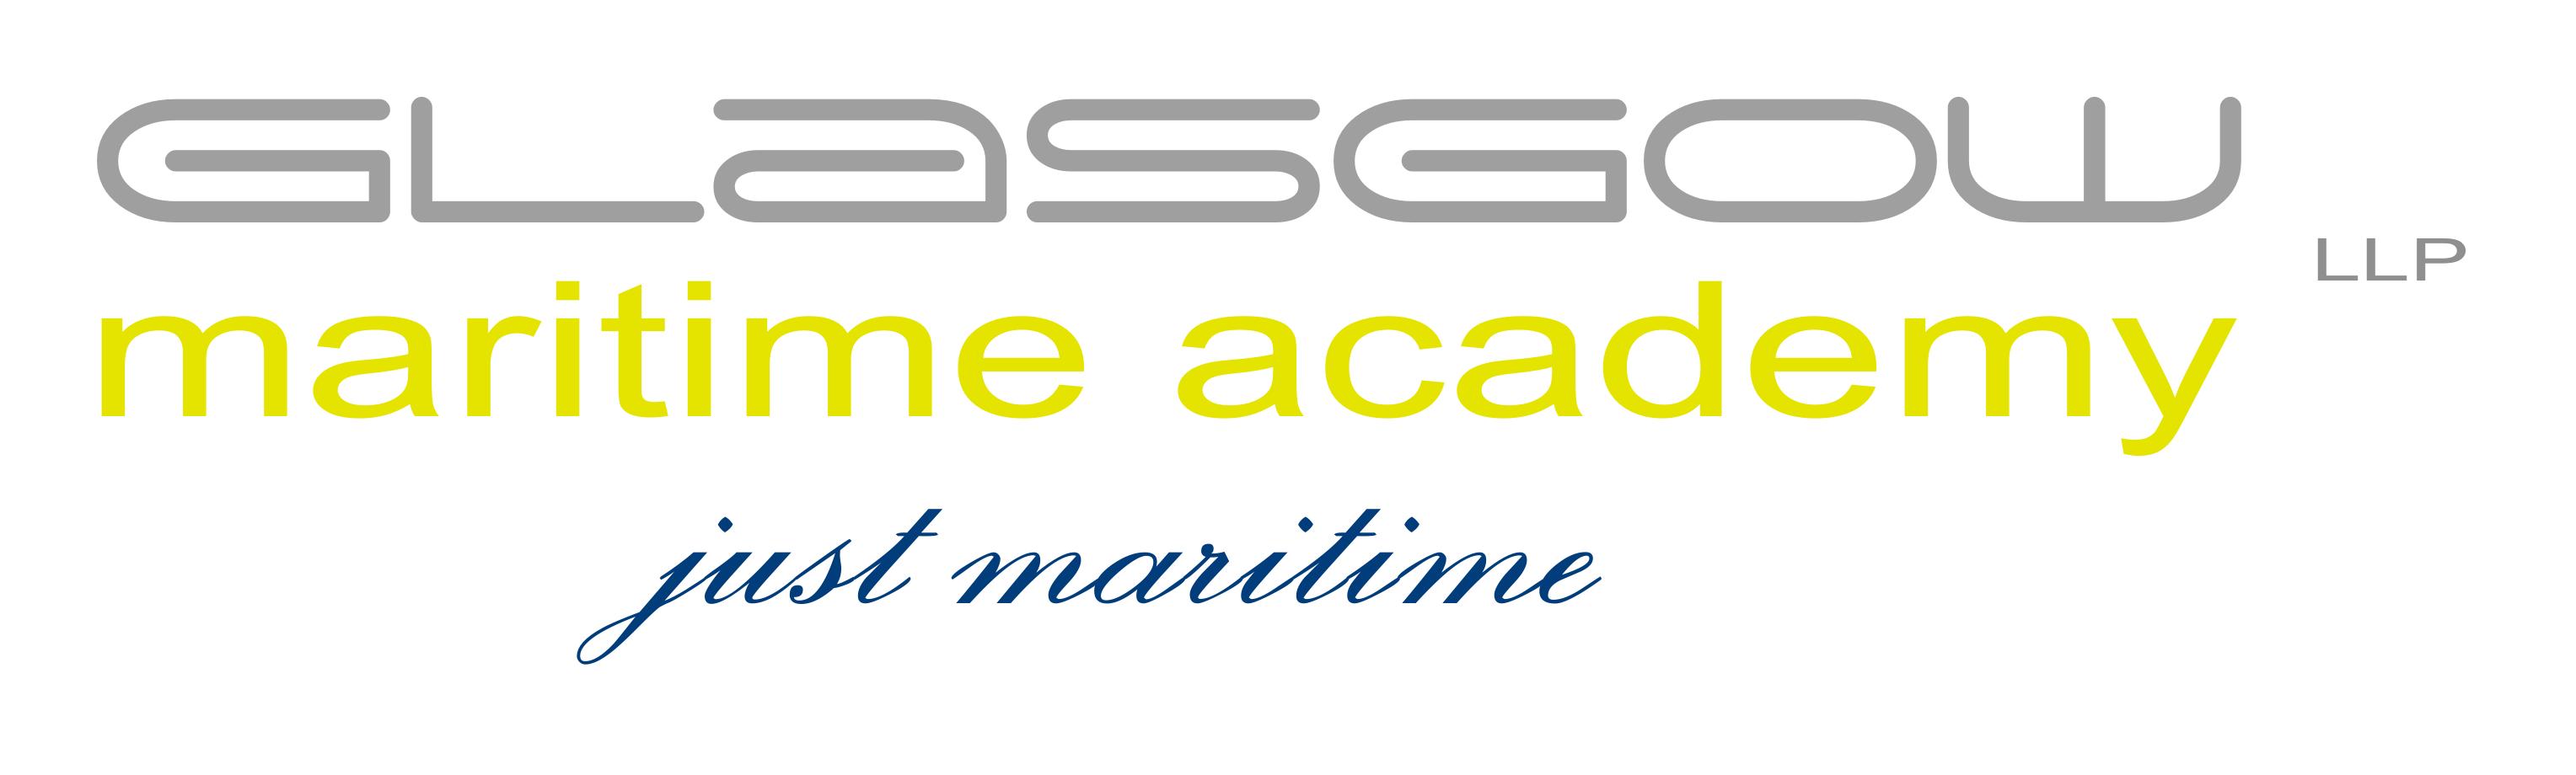 Glasgow Maritime Academy